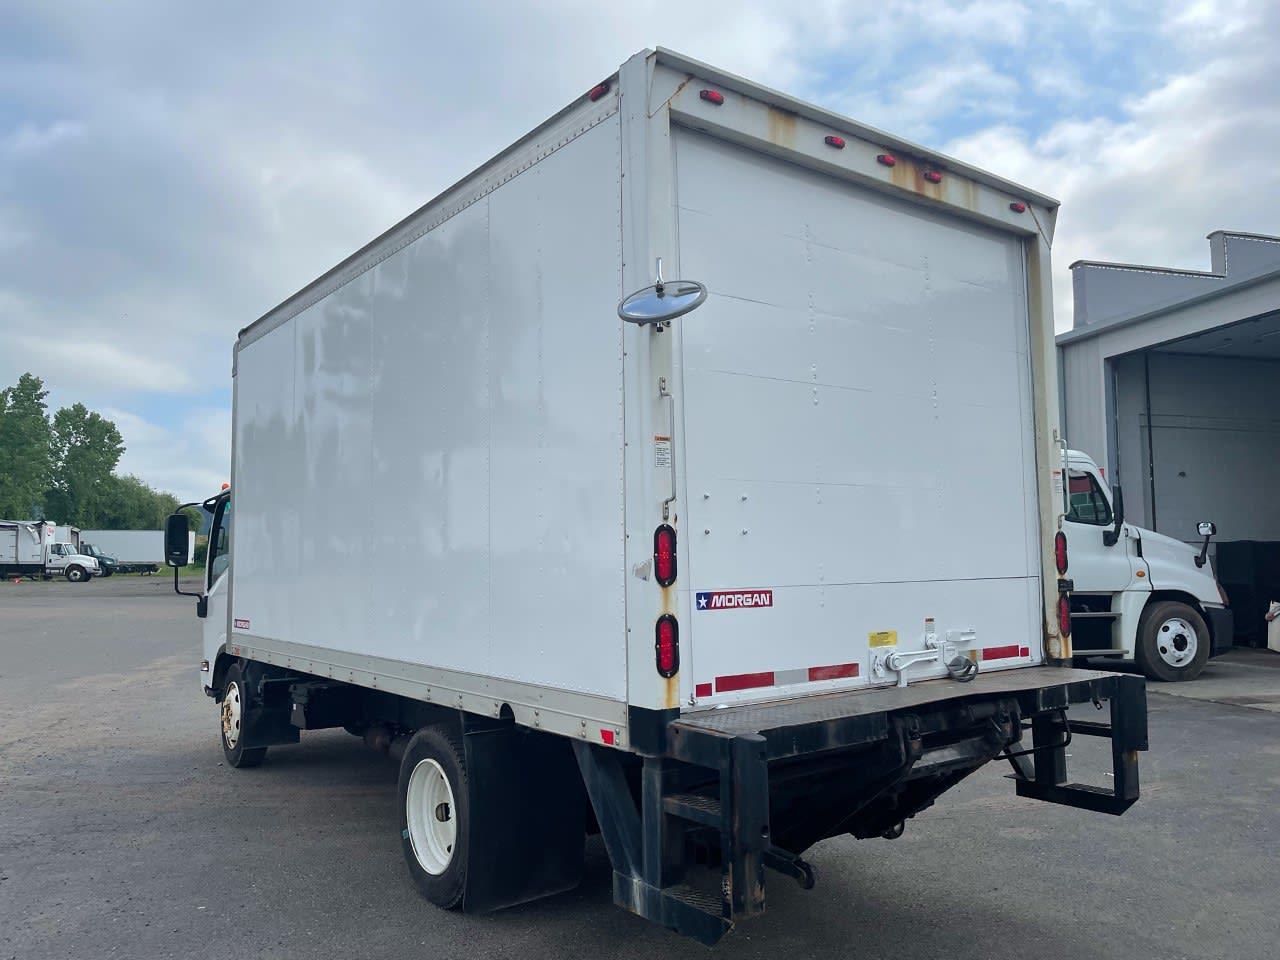 2014 Isuzu NPR-HD Regular Cab 4x2, Dry Freight #571155 - photo 1